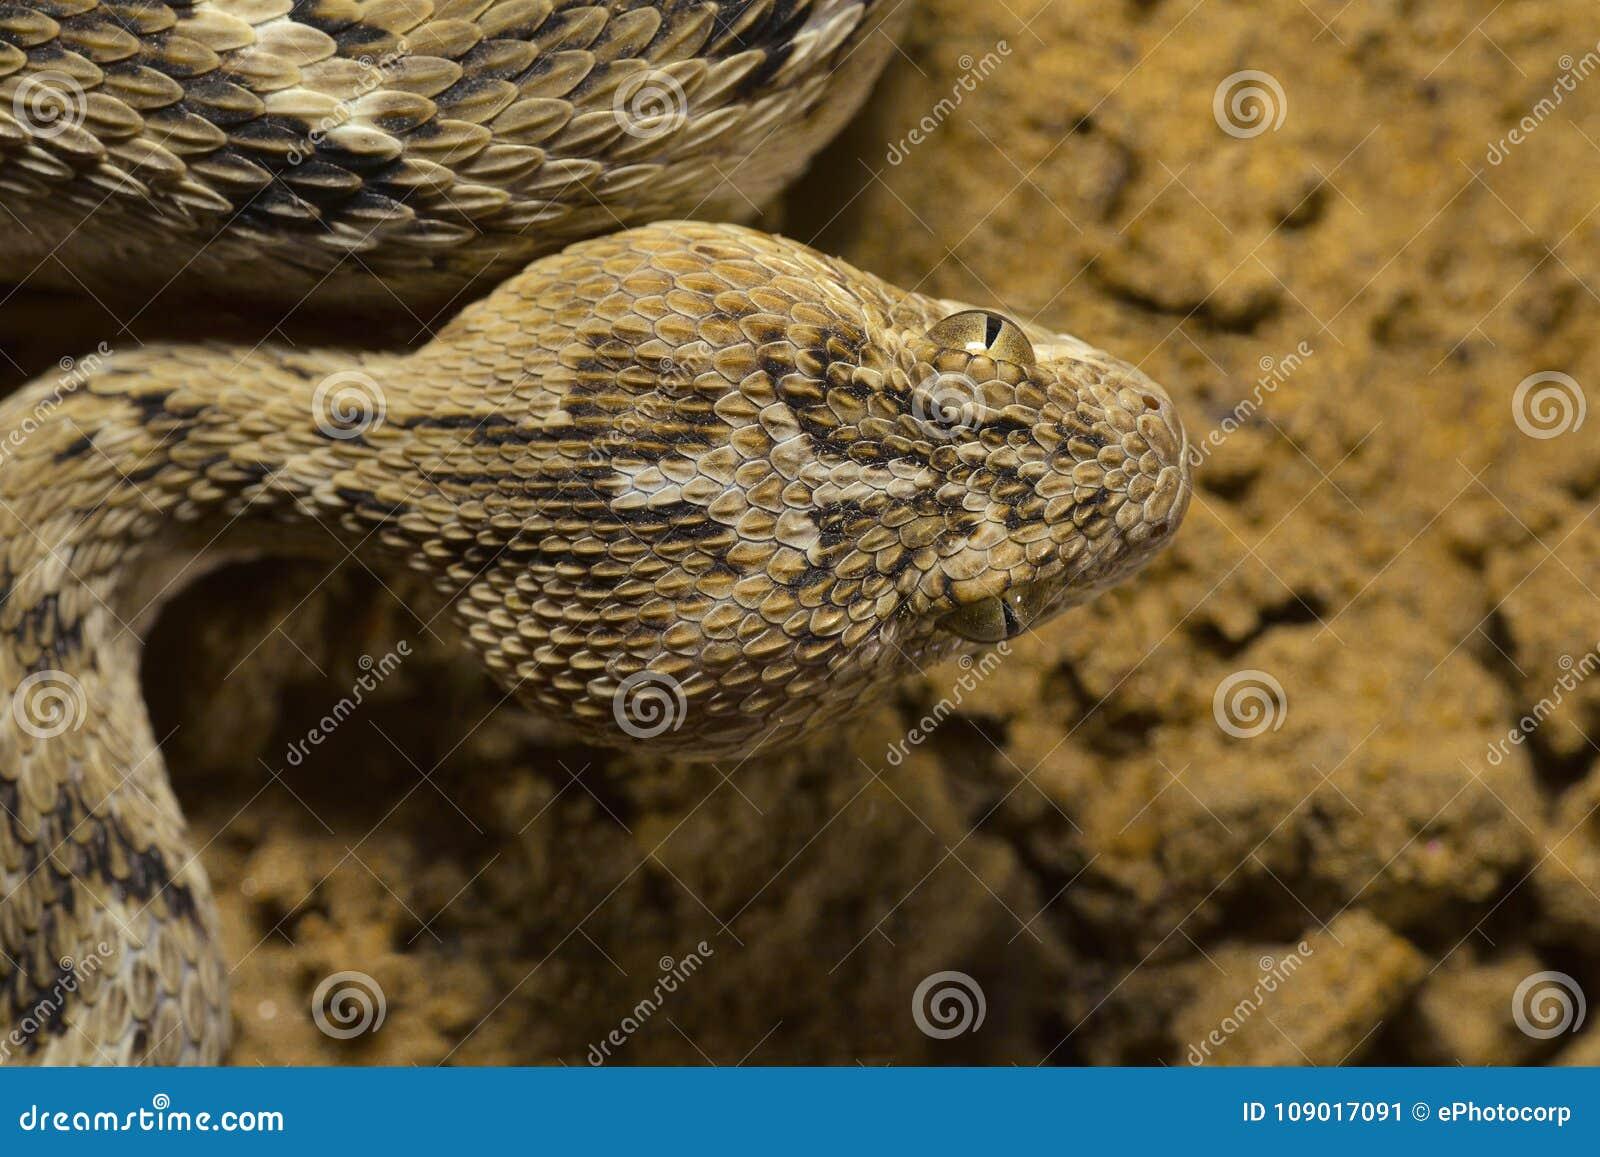 Sochurek`s Saw-scaled Viper, Echis Carinatus Sochureki Closeup of Head. Desert National Park